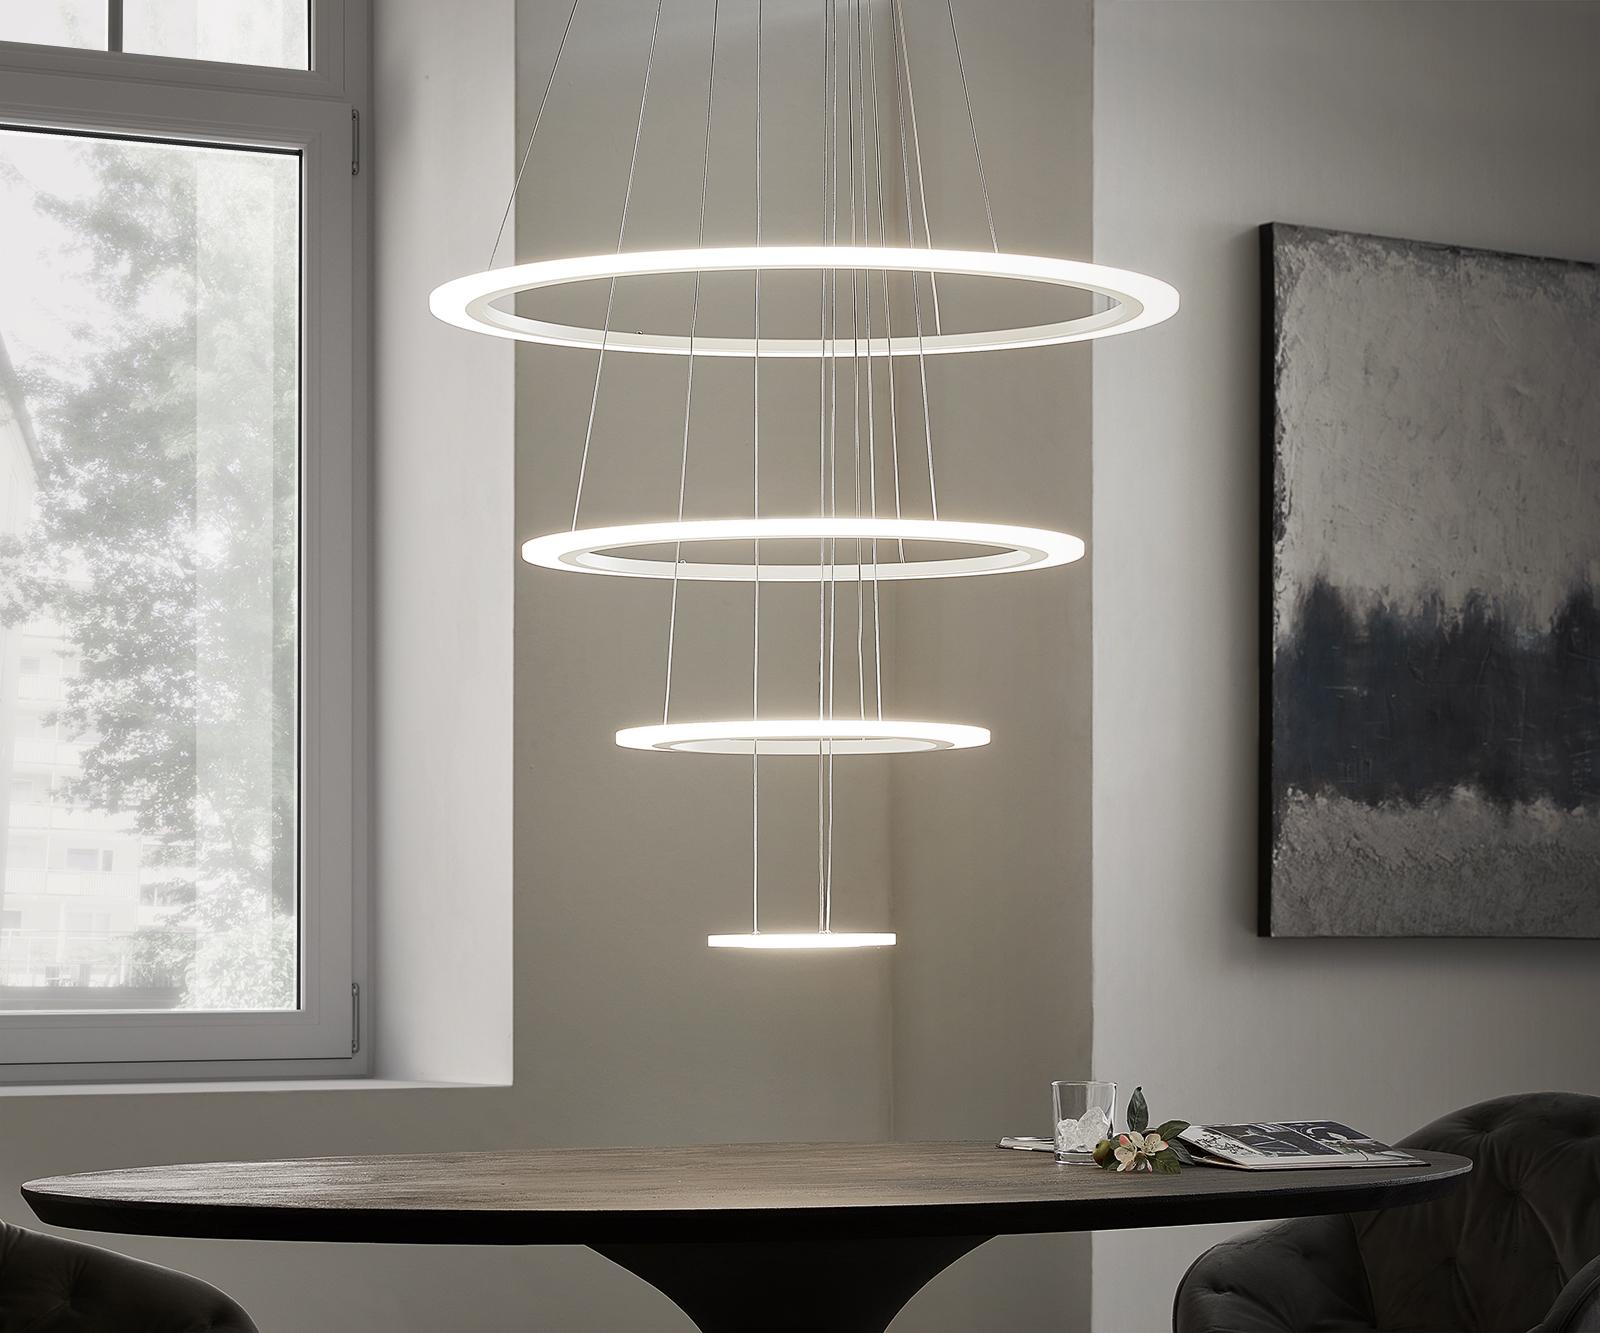 Deckenleuchte Tondo weiss D80x150 cm LED 4 Ringe Designlampe